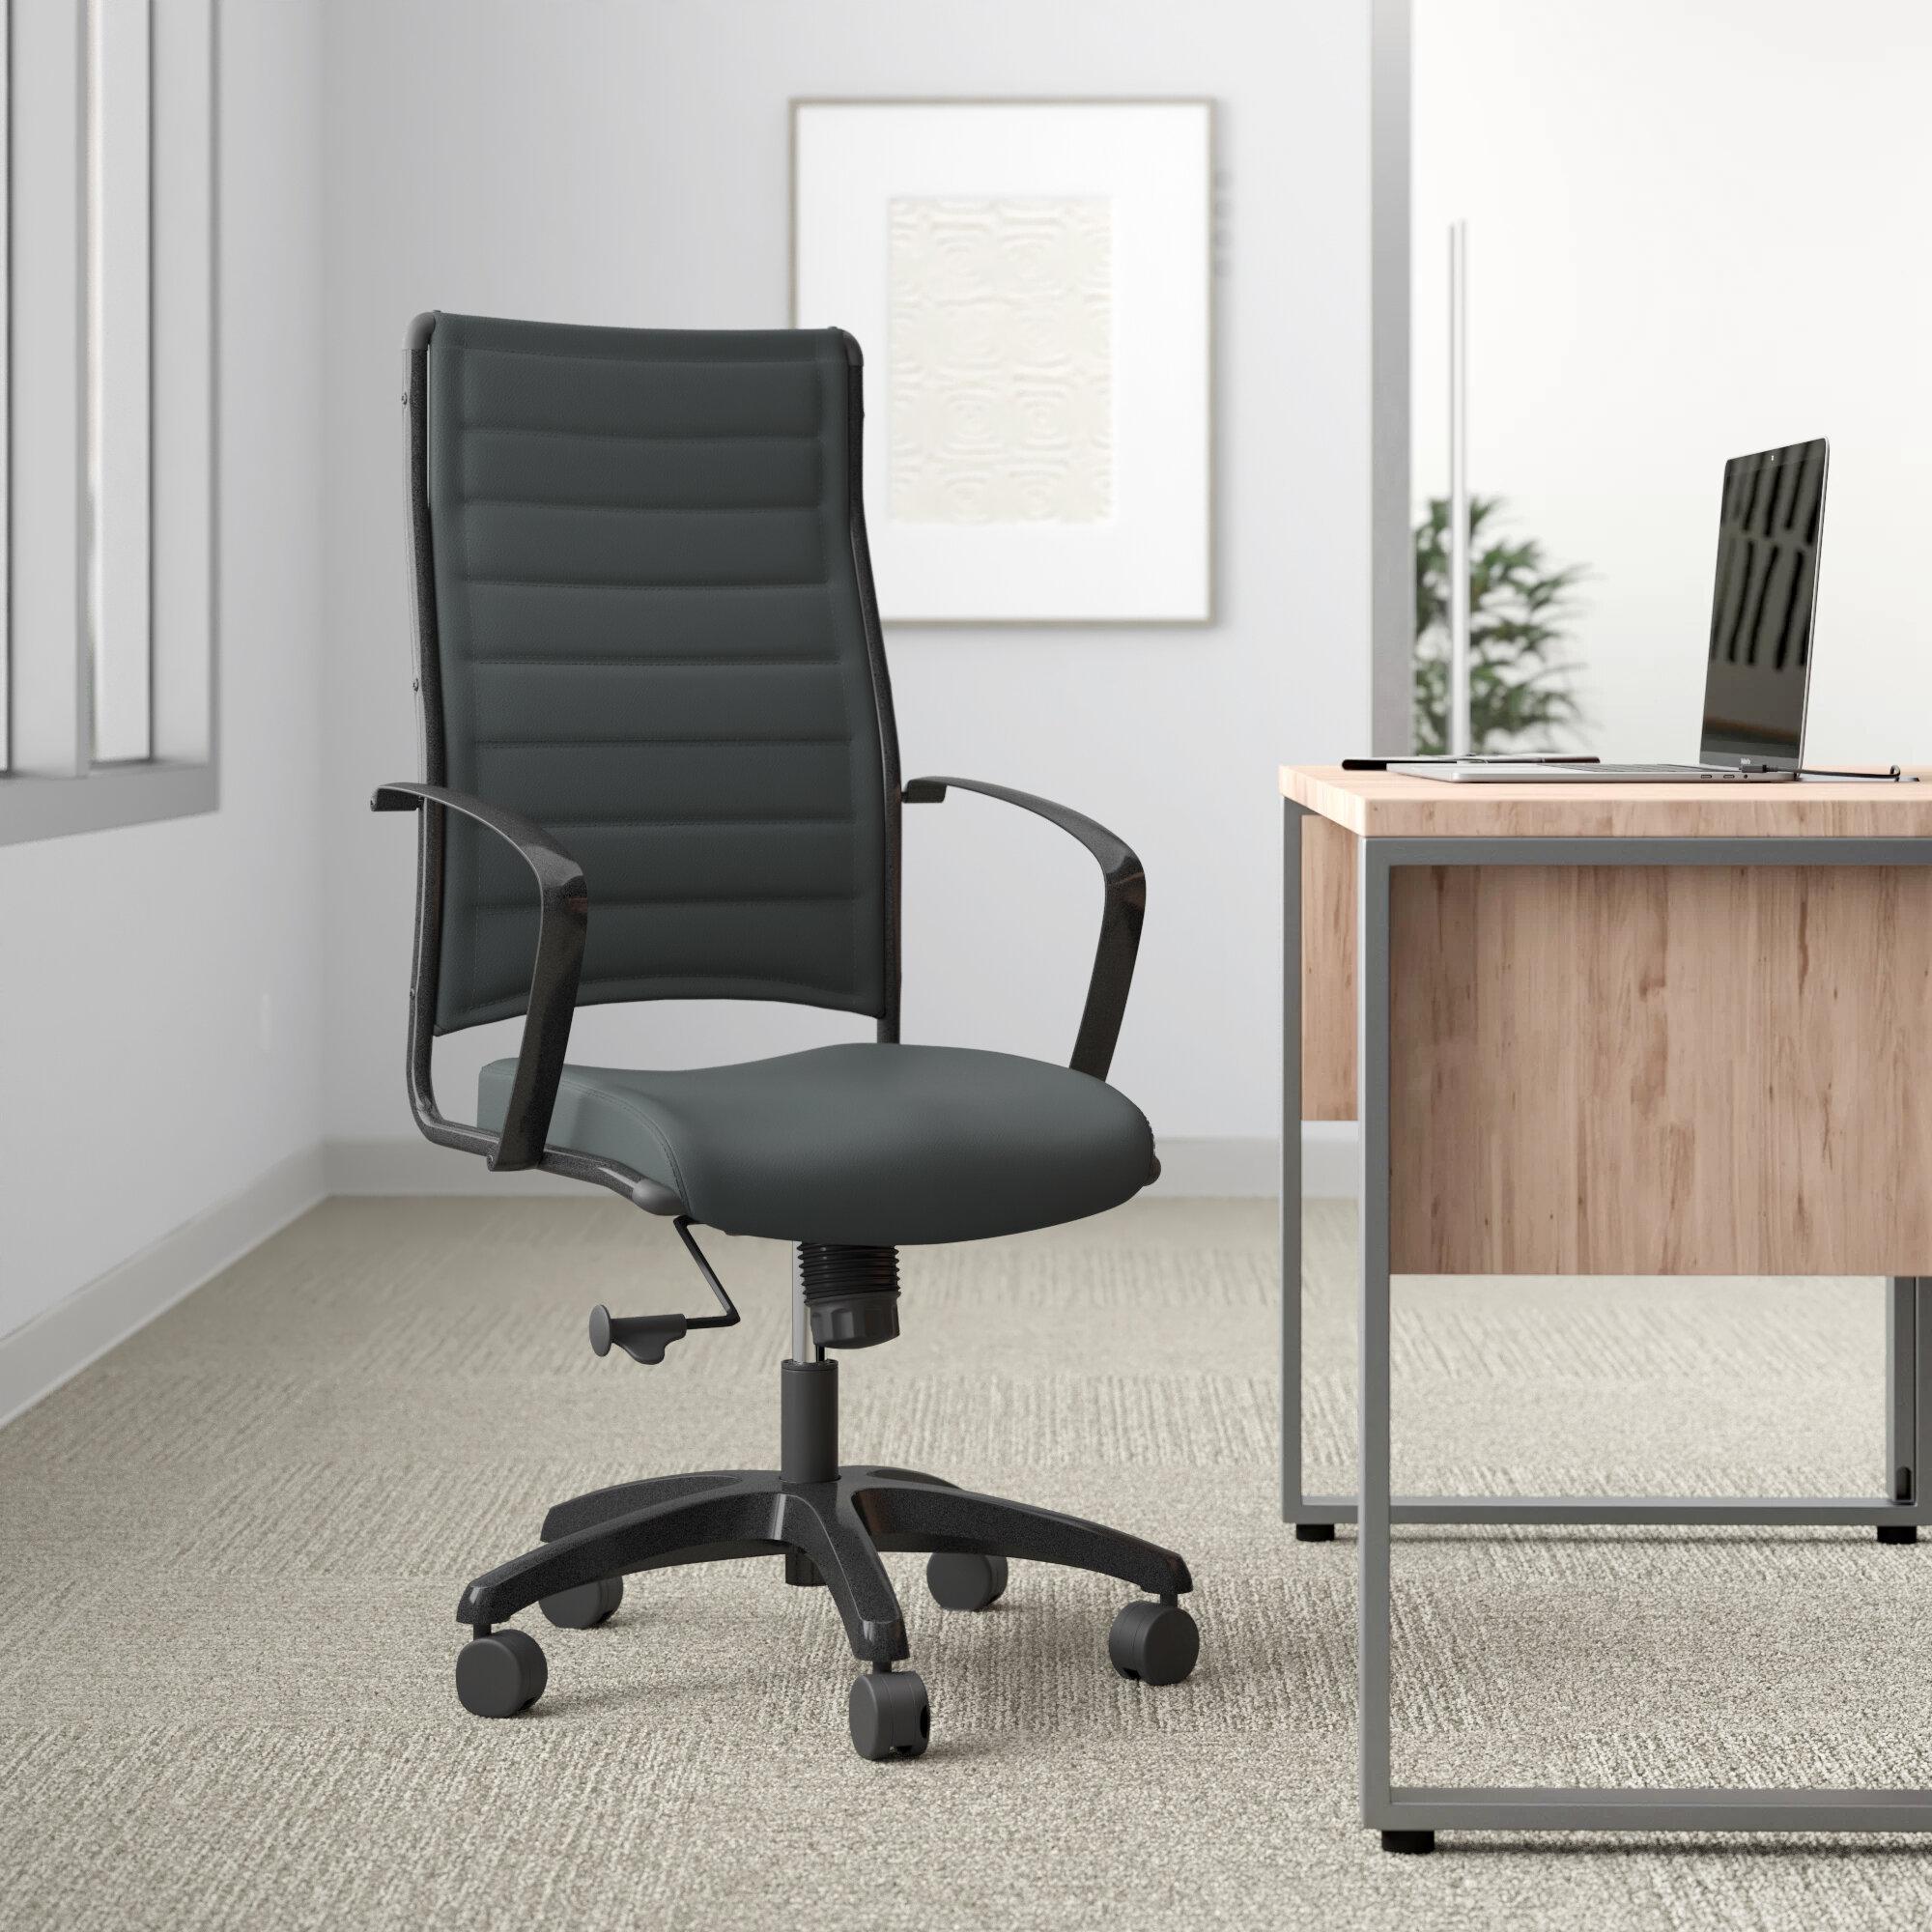 Knee Tilt Office Chairs You Ll Love In 2021 Wayfair